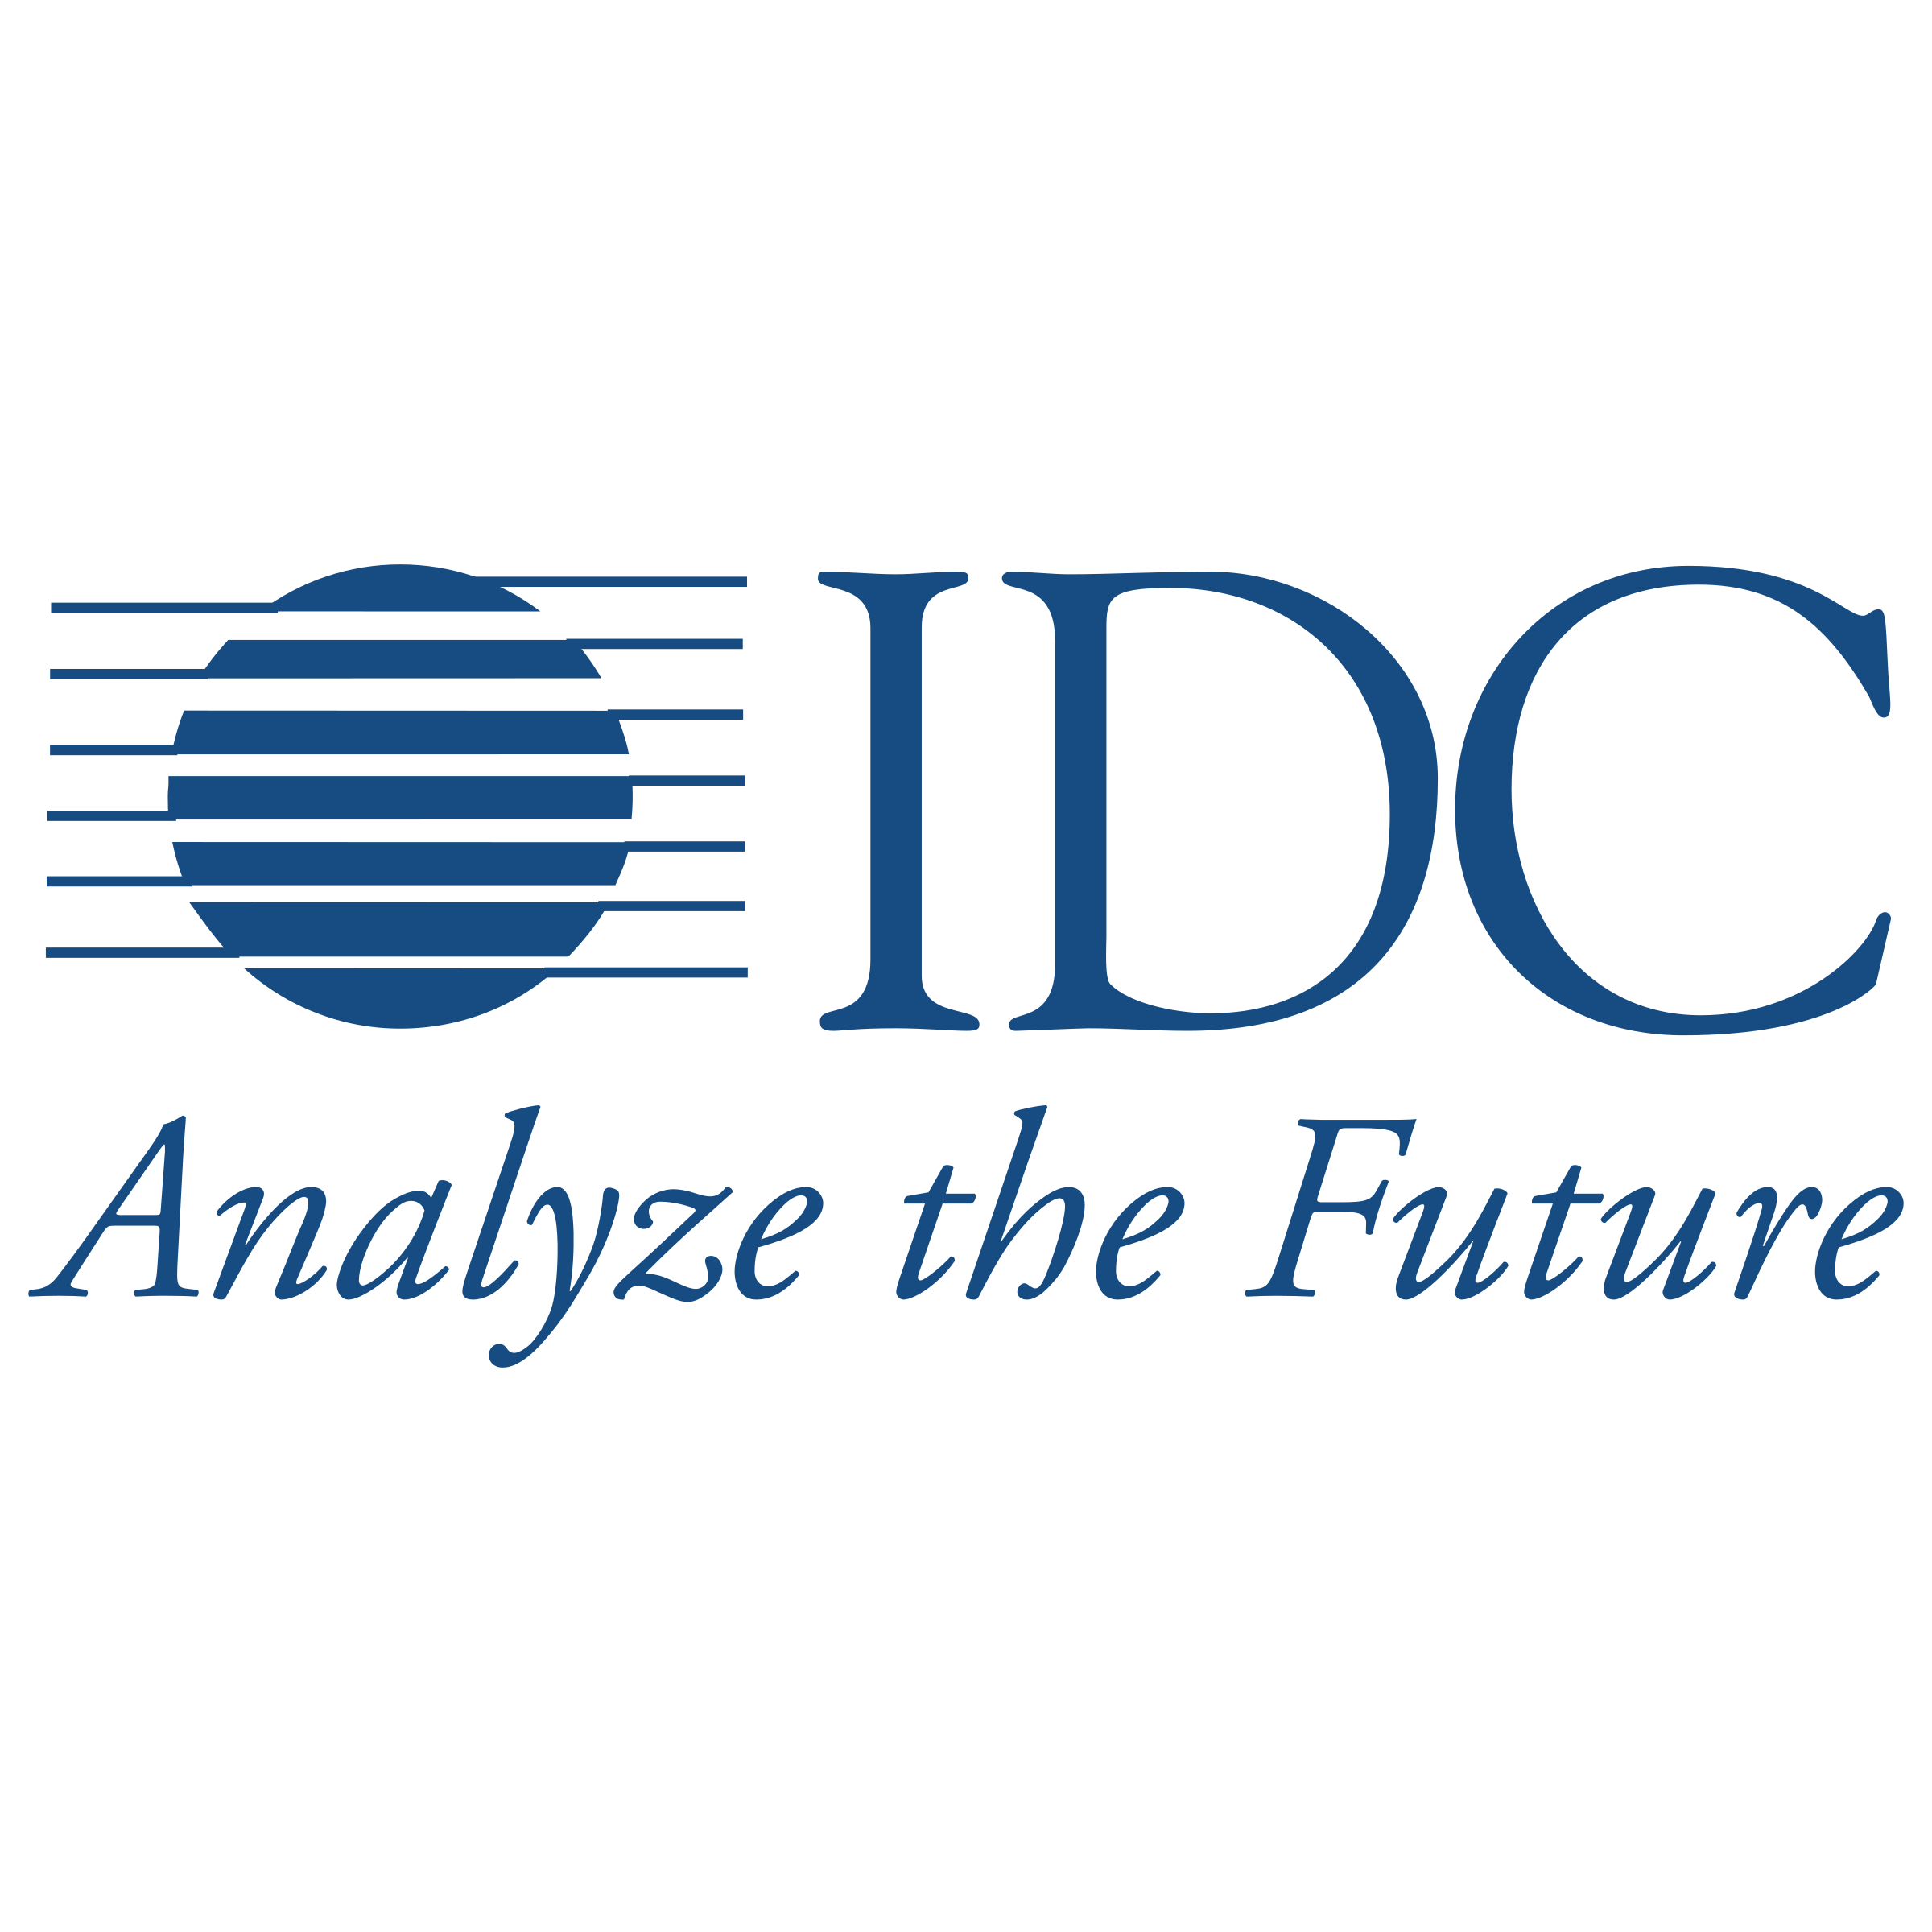 idc-logo-png-transparent